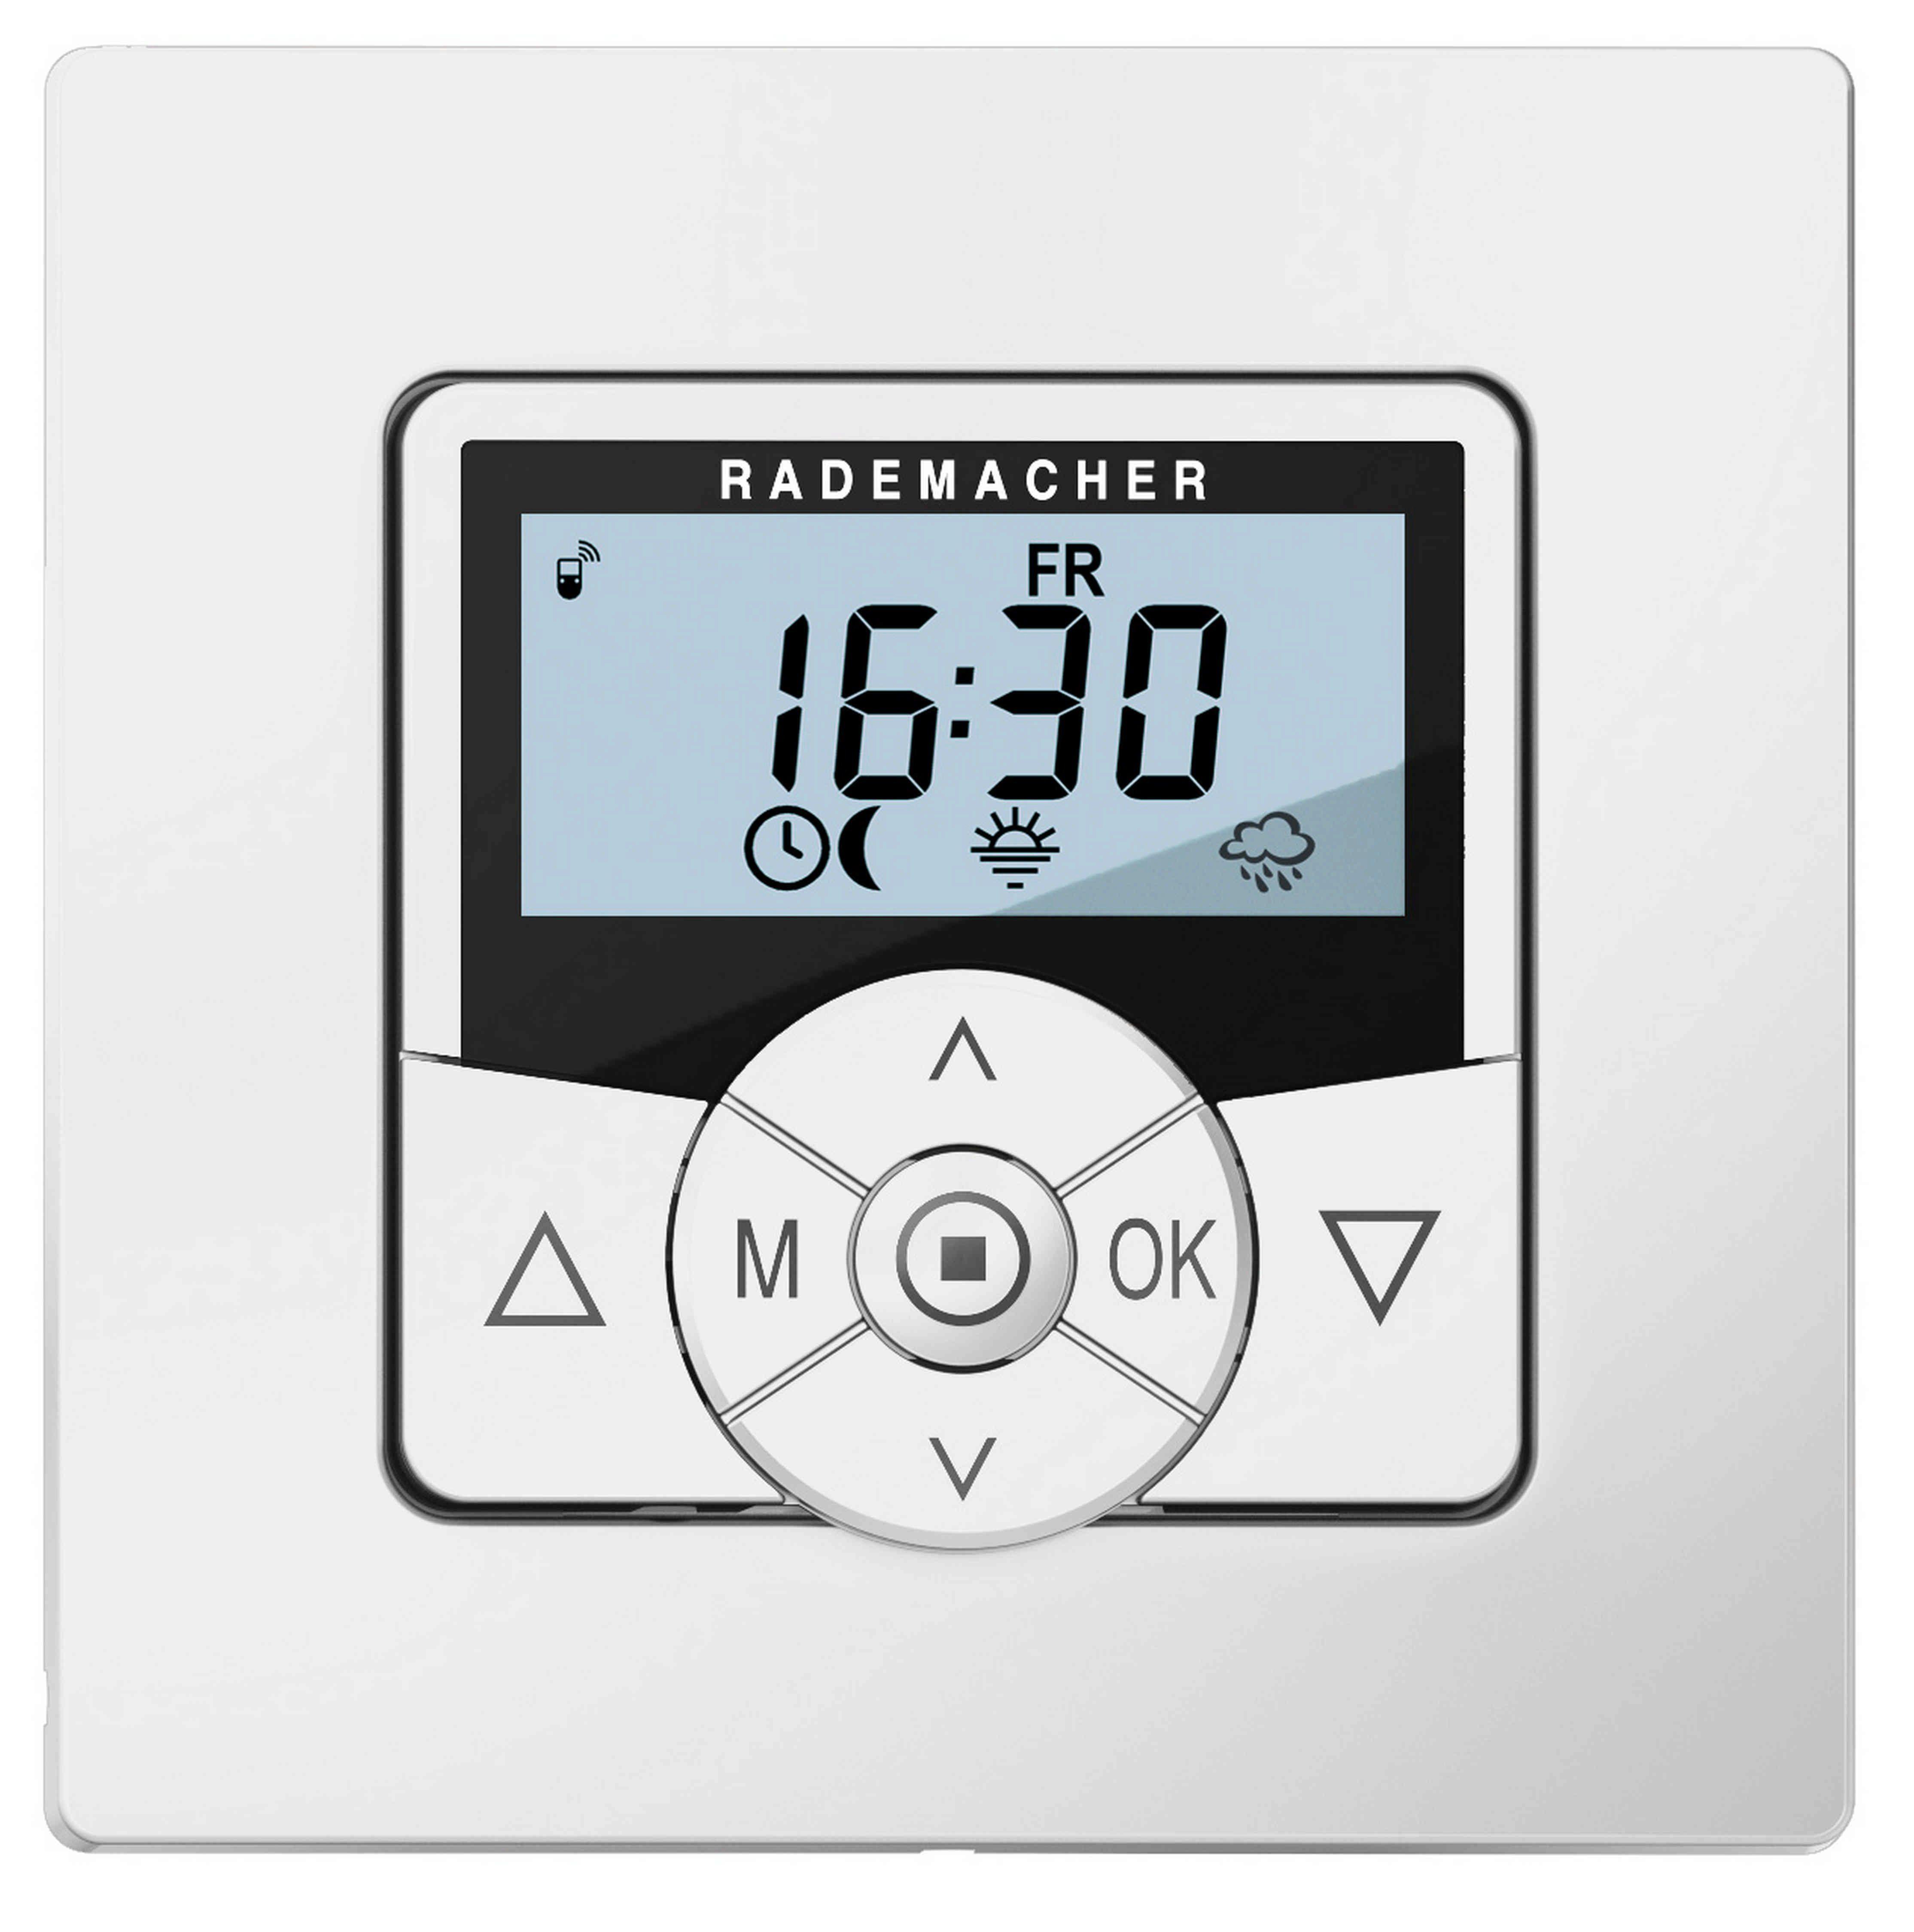 Rademacher Smart Home - Funkfähige Zeitschaltuhr für Rohrmotoren »Troll Comfort DuoFern 5665-UW«